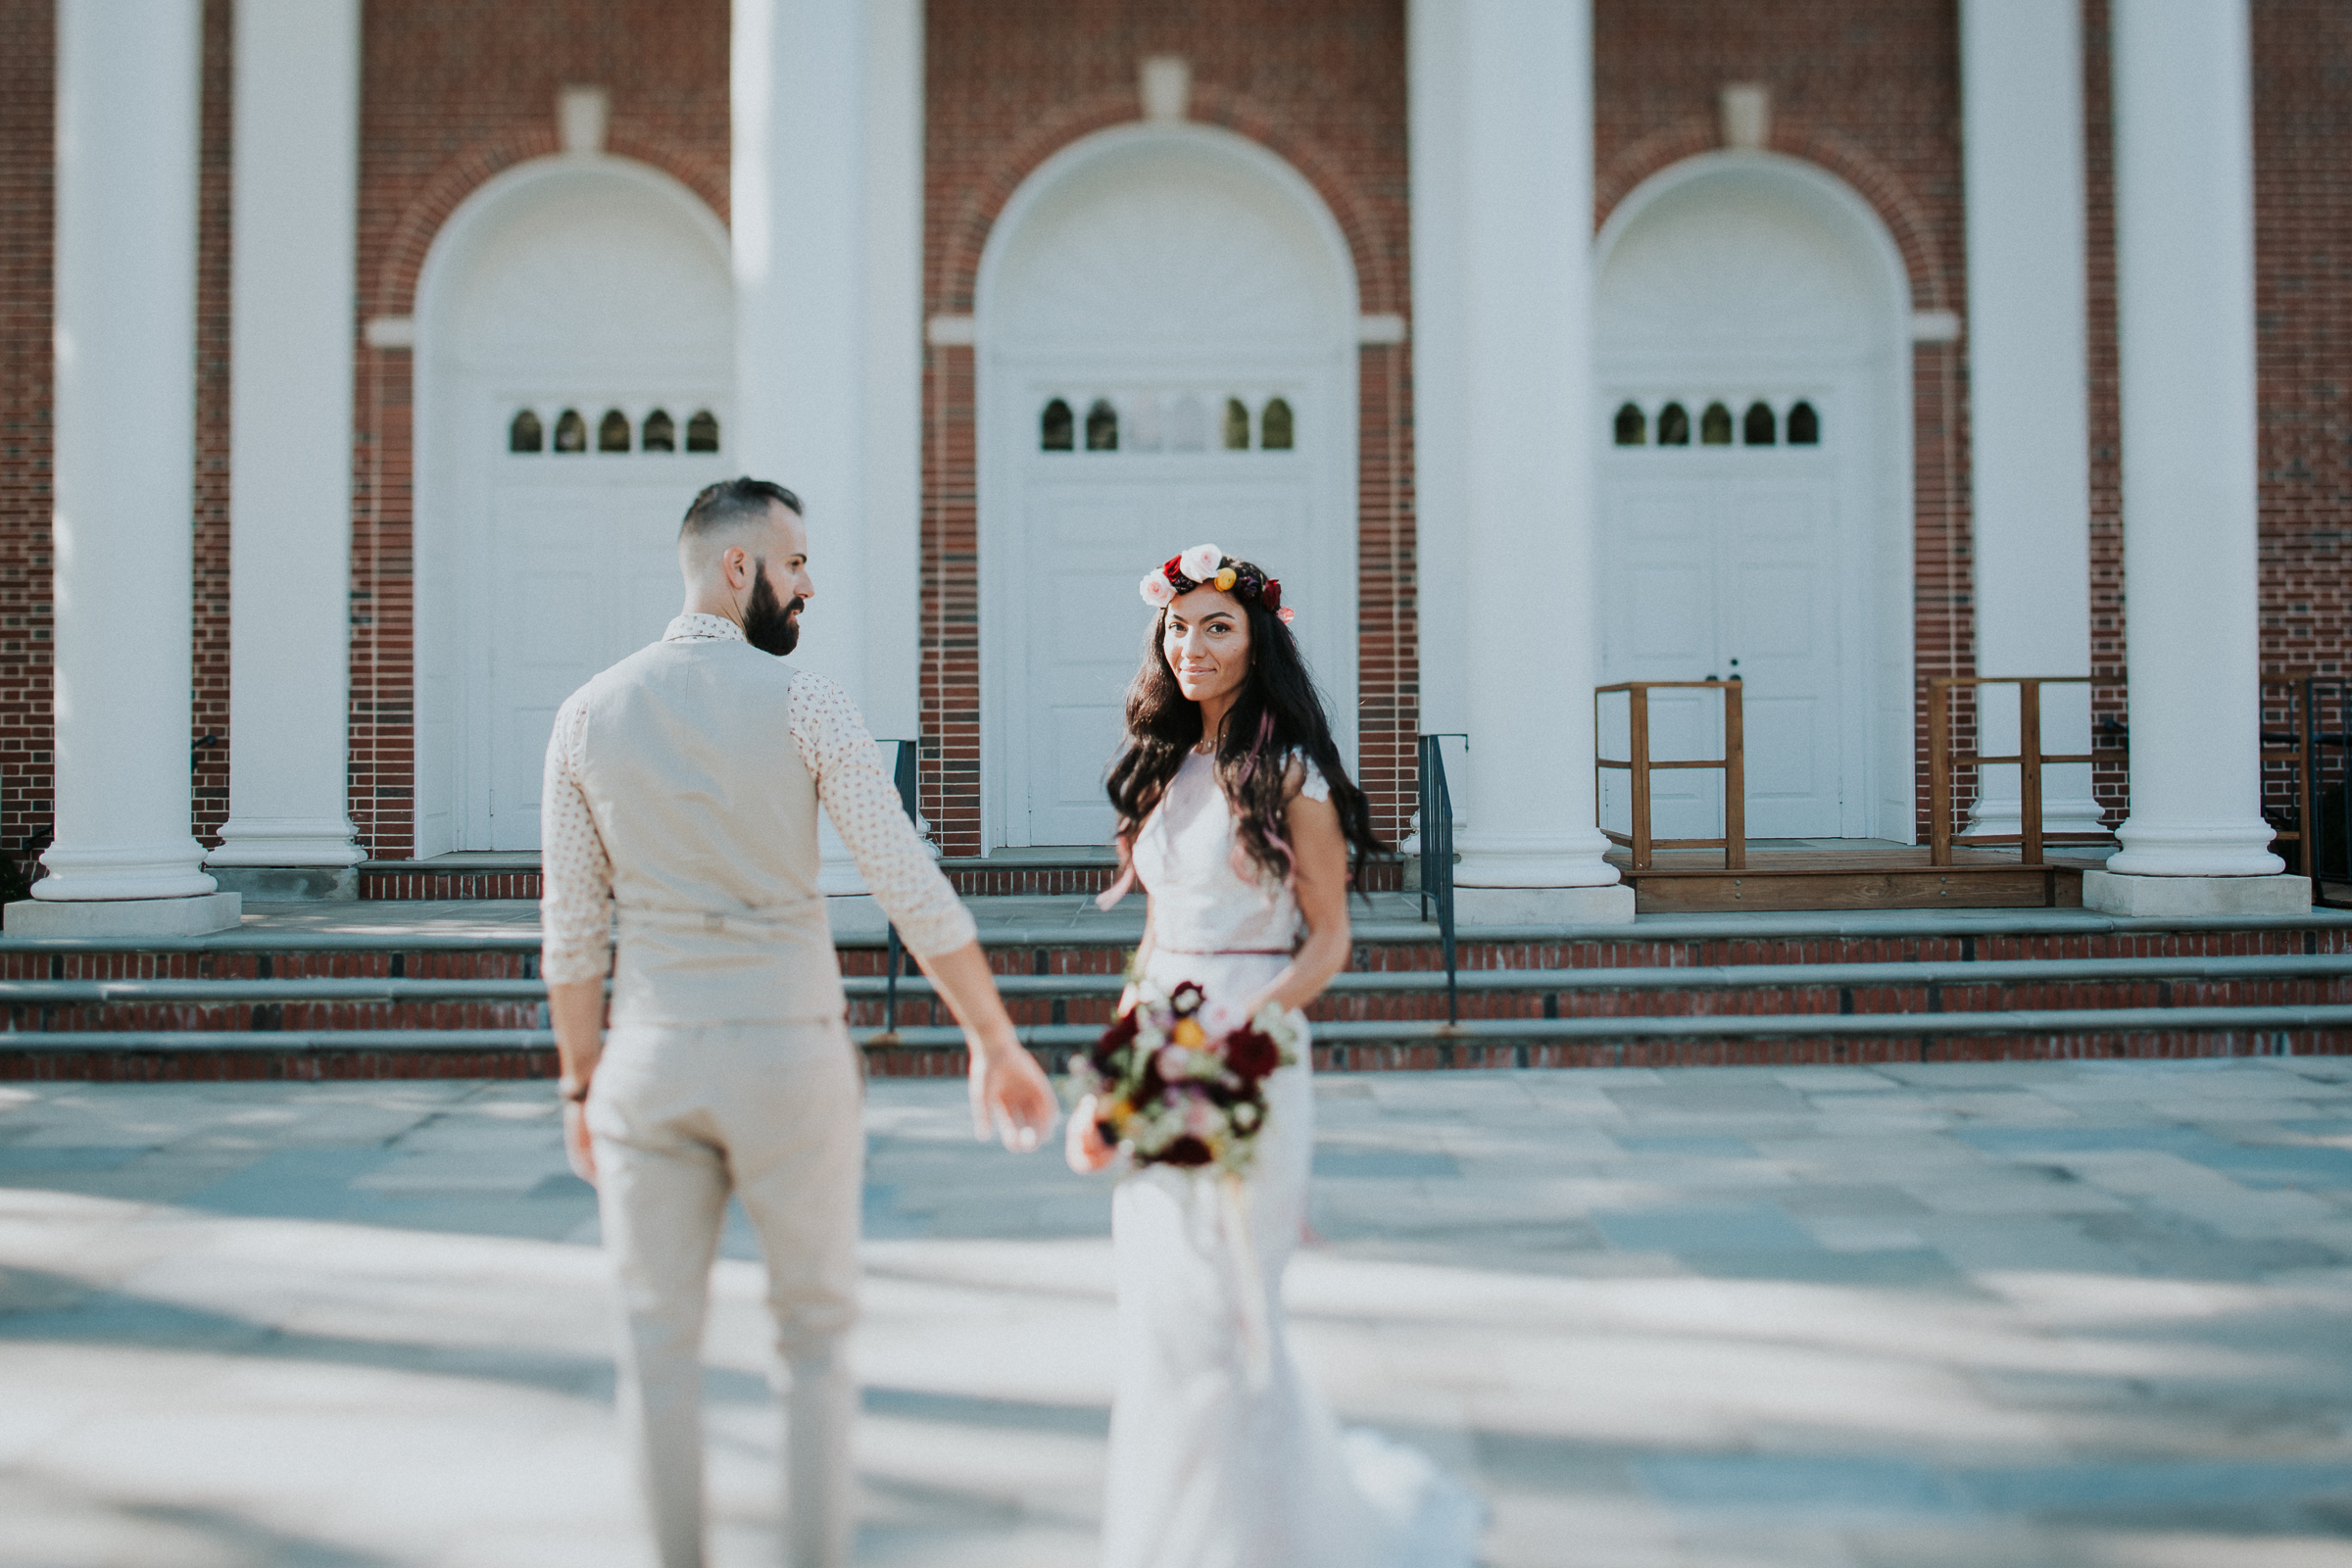 Backyard-Intimate-Adventurous-Destination-Wedding-Darien-Connecticut-Documentary-Wedding-Photography-77.jpg